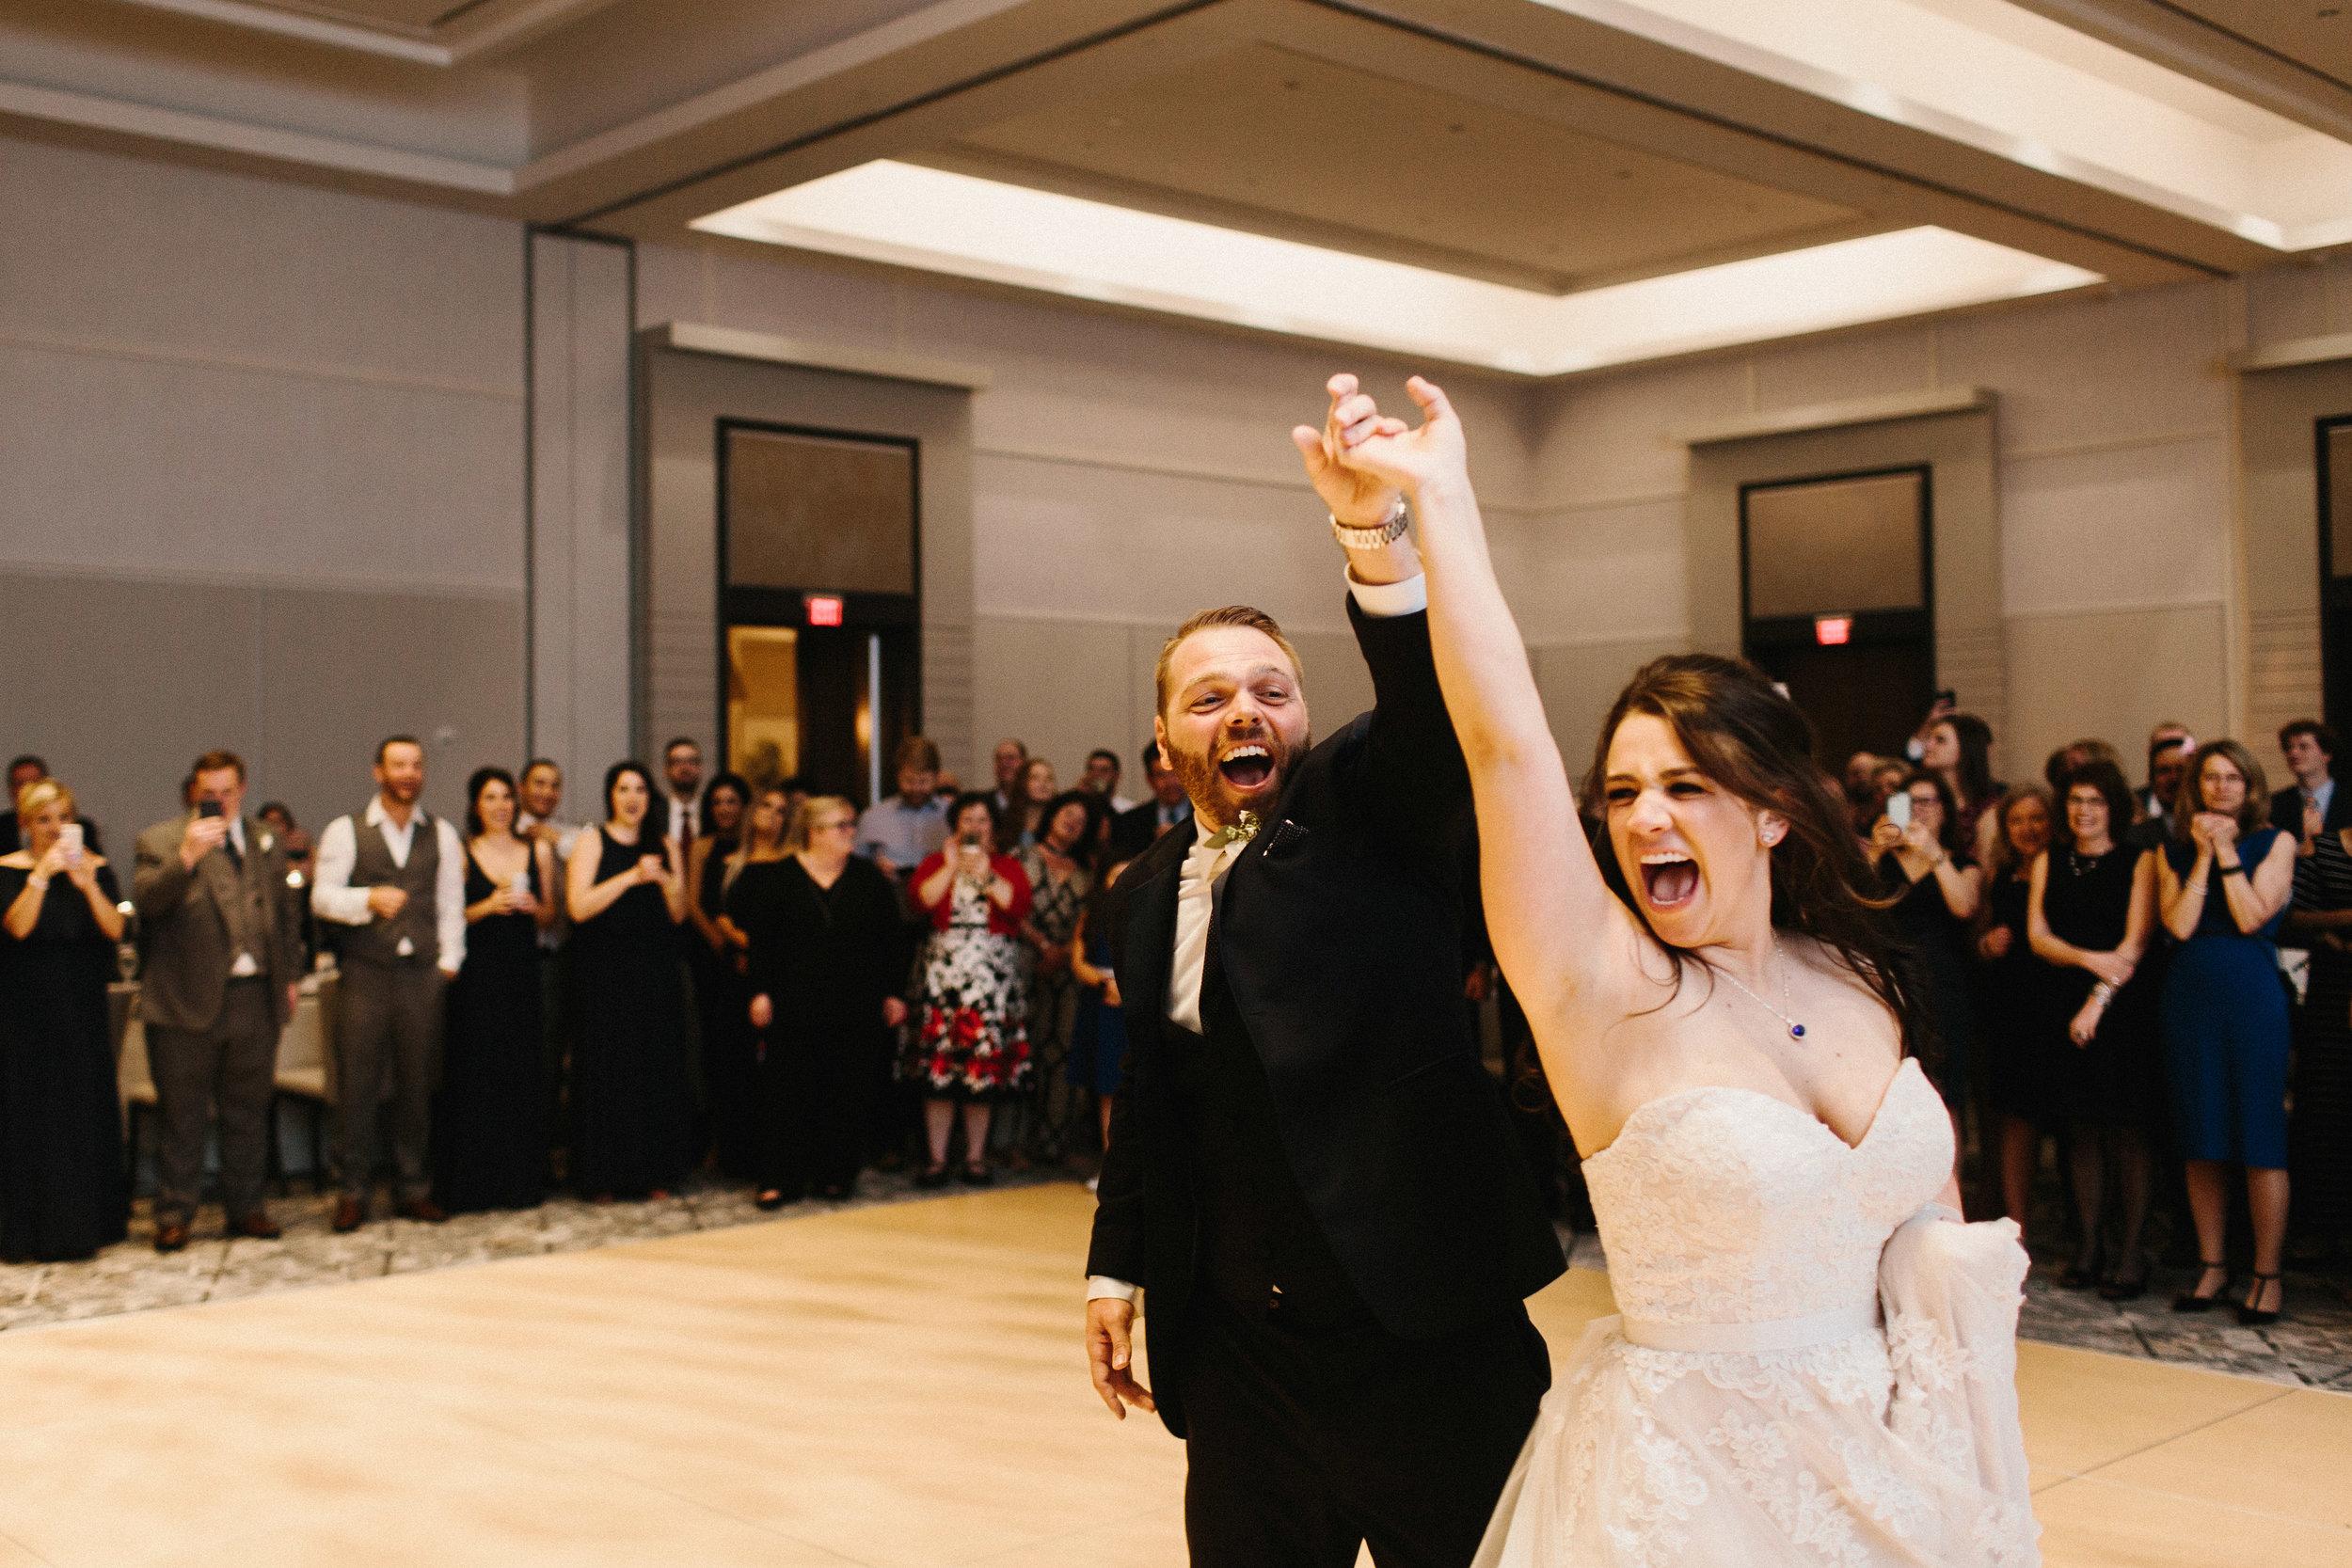 roswell_st_peter_chanel_catholic_avalon_hotel_alpharetta_wedding-2035.jpg